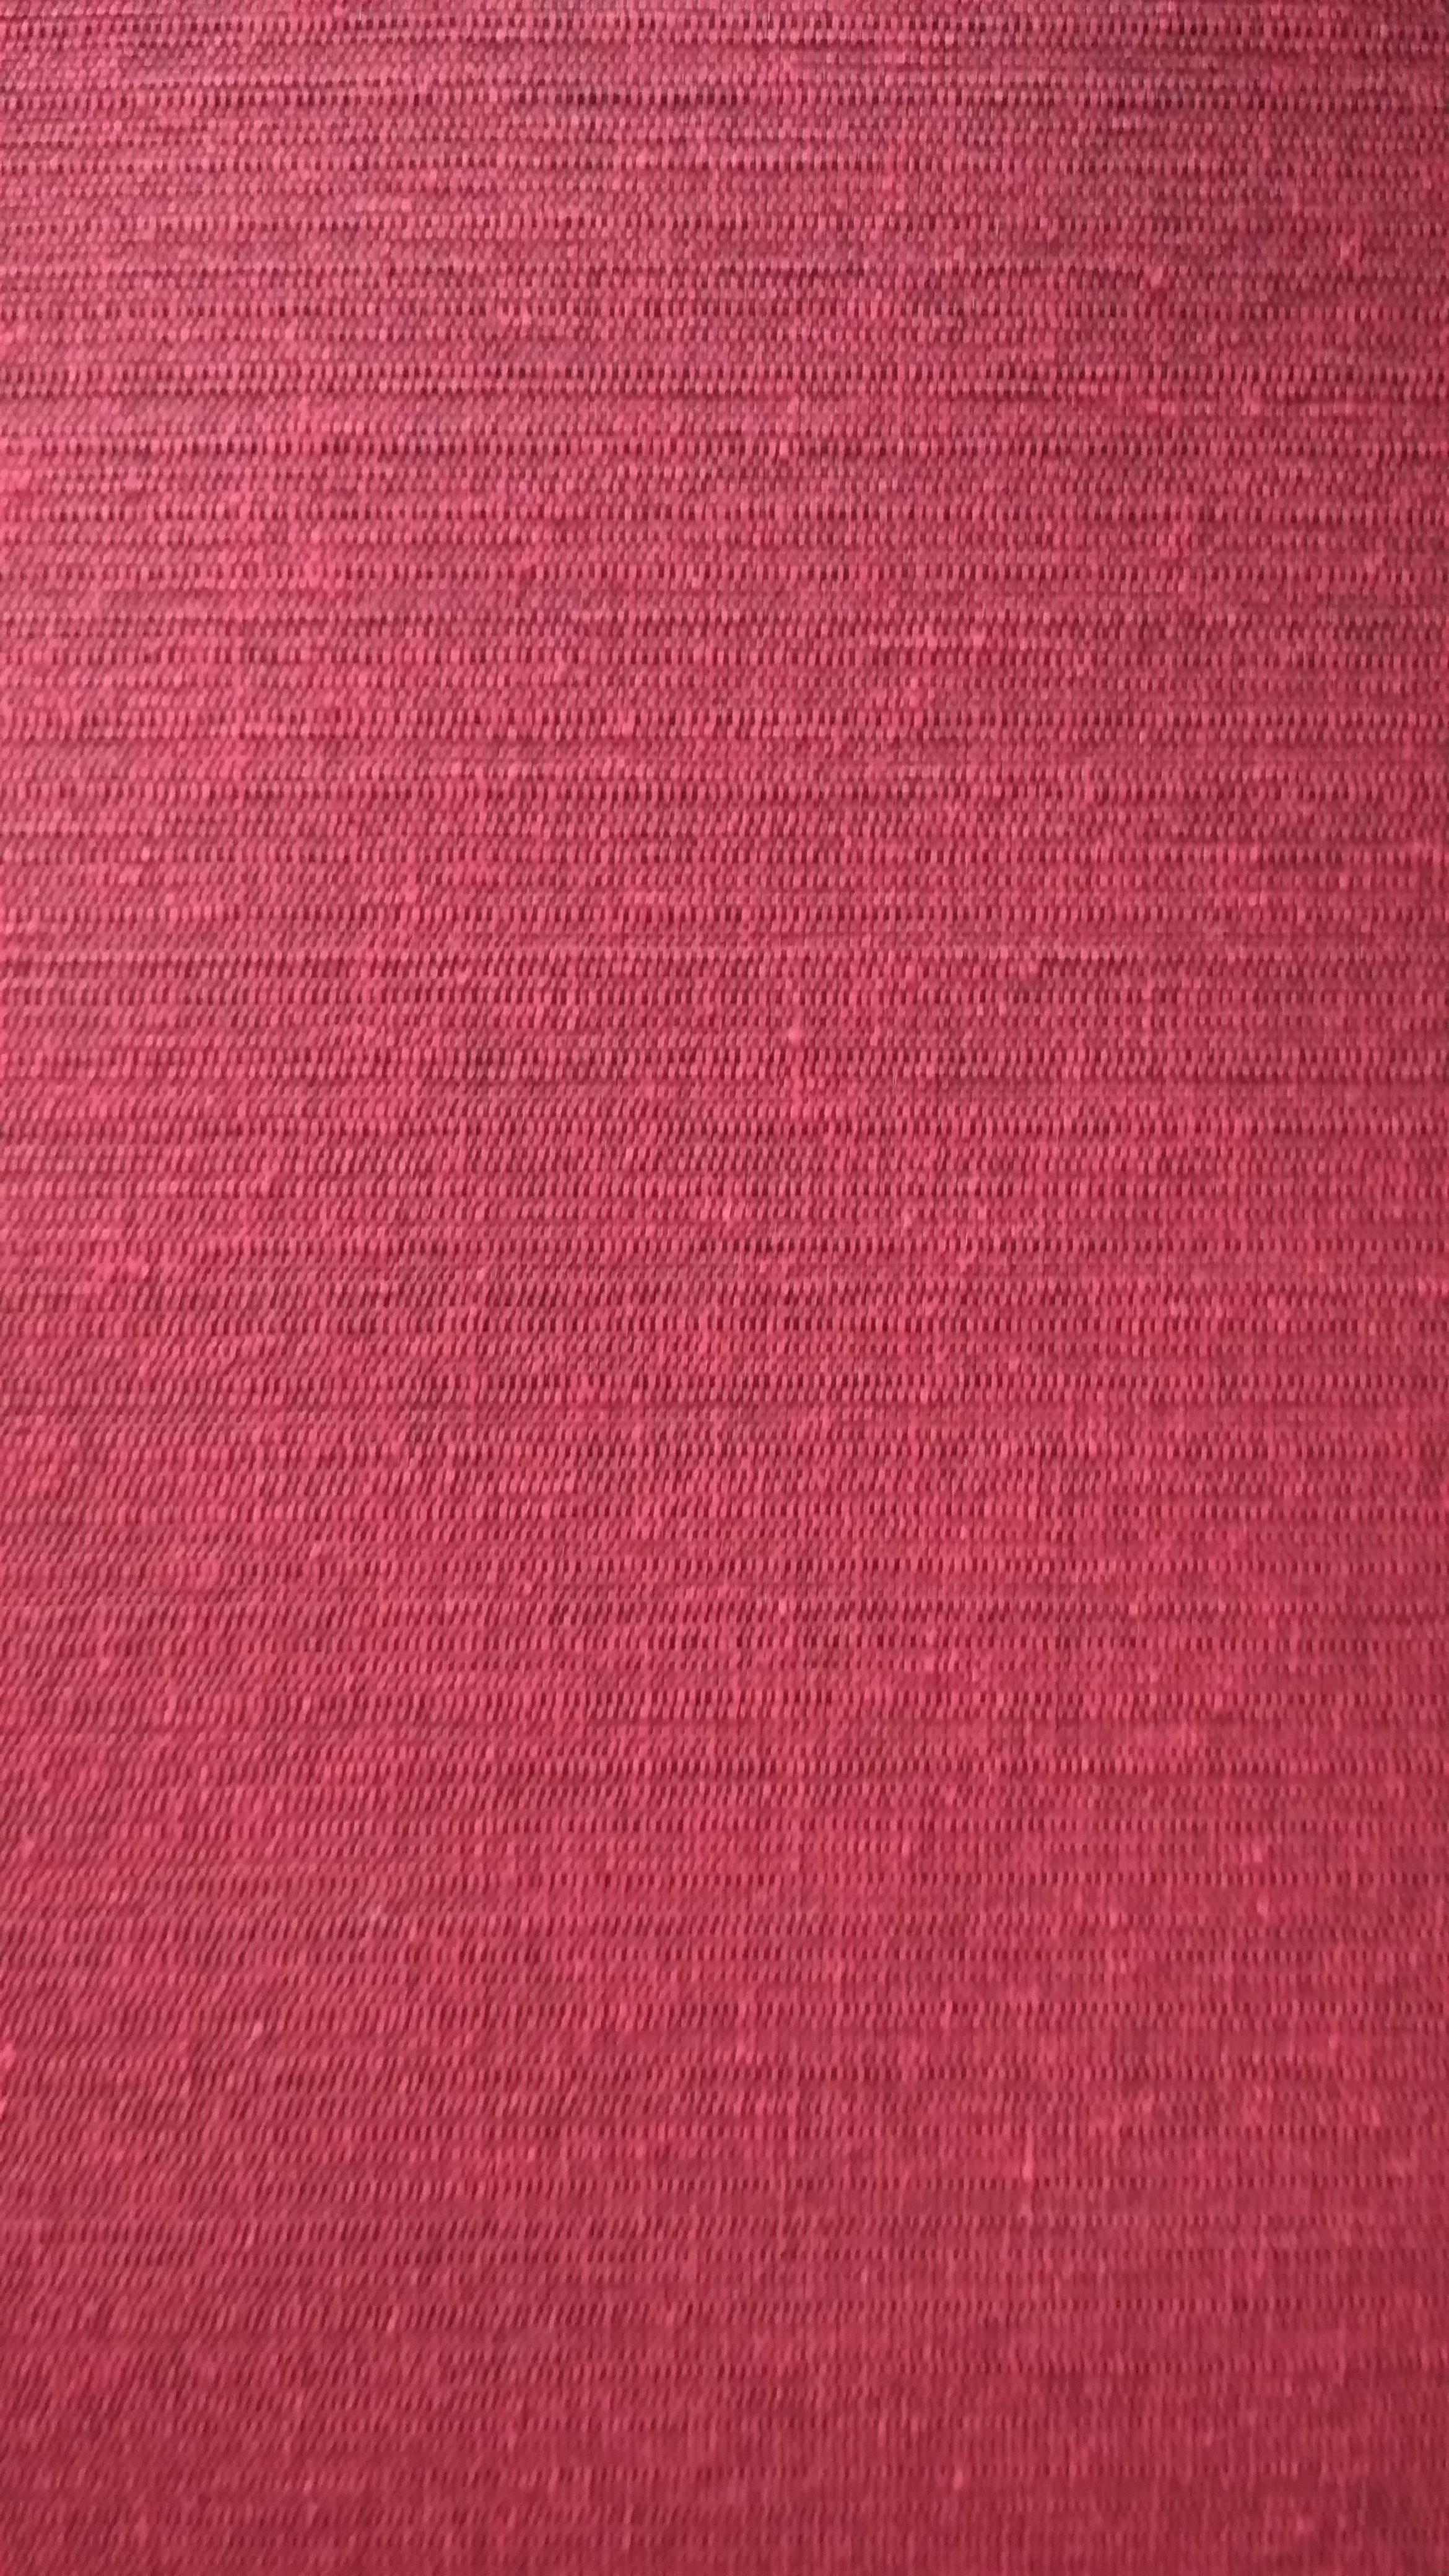 ELEGANT 2428 - polstr na zahradní lehátko s podhlavníkem